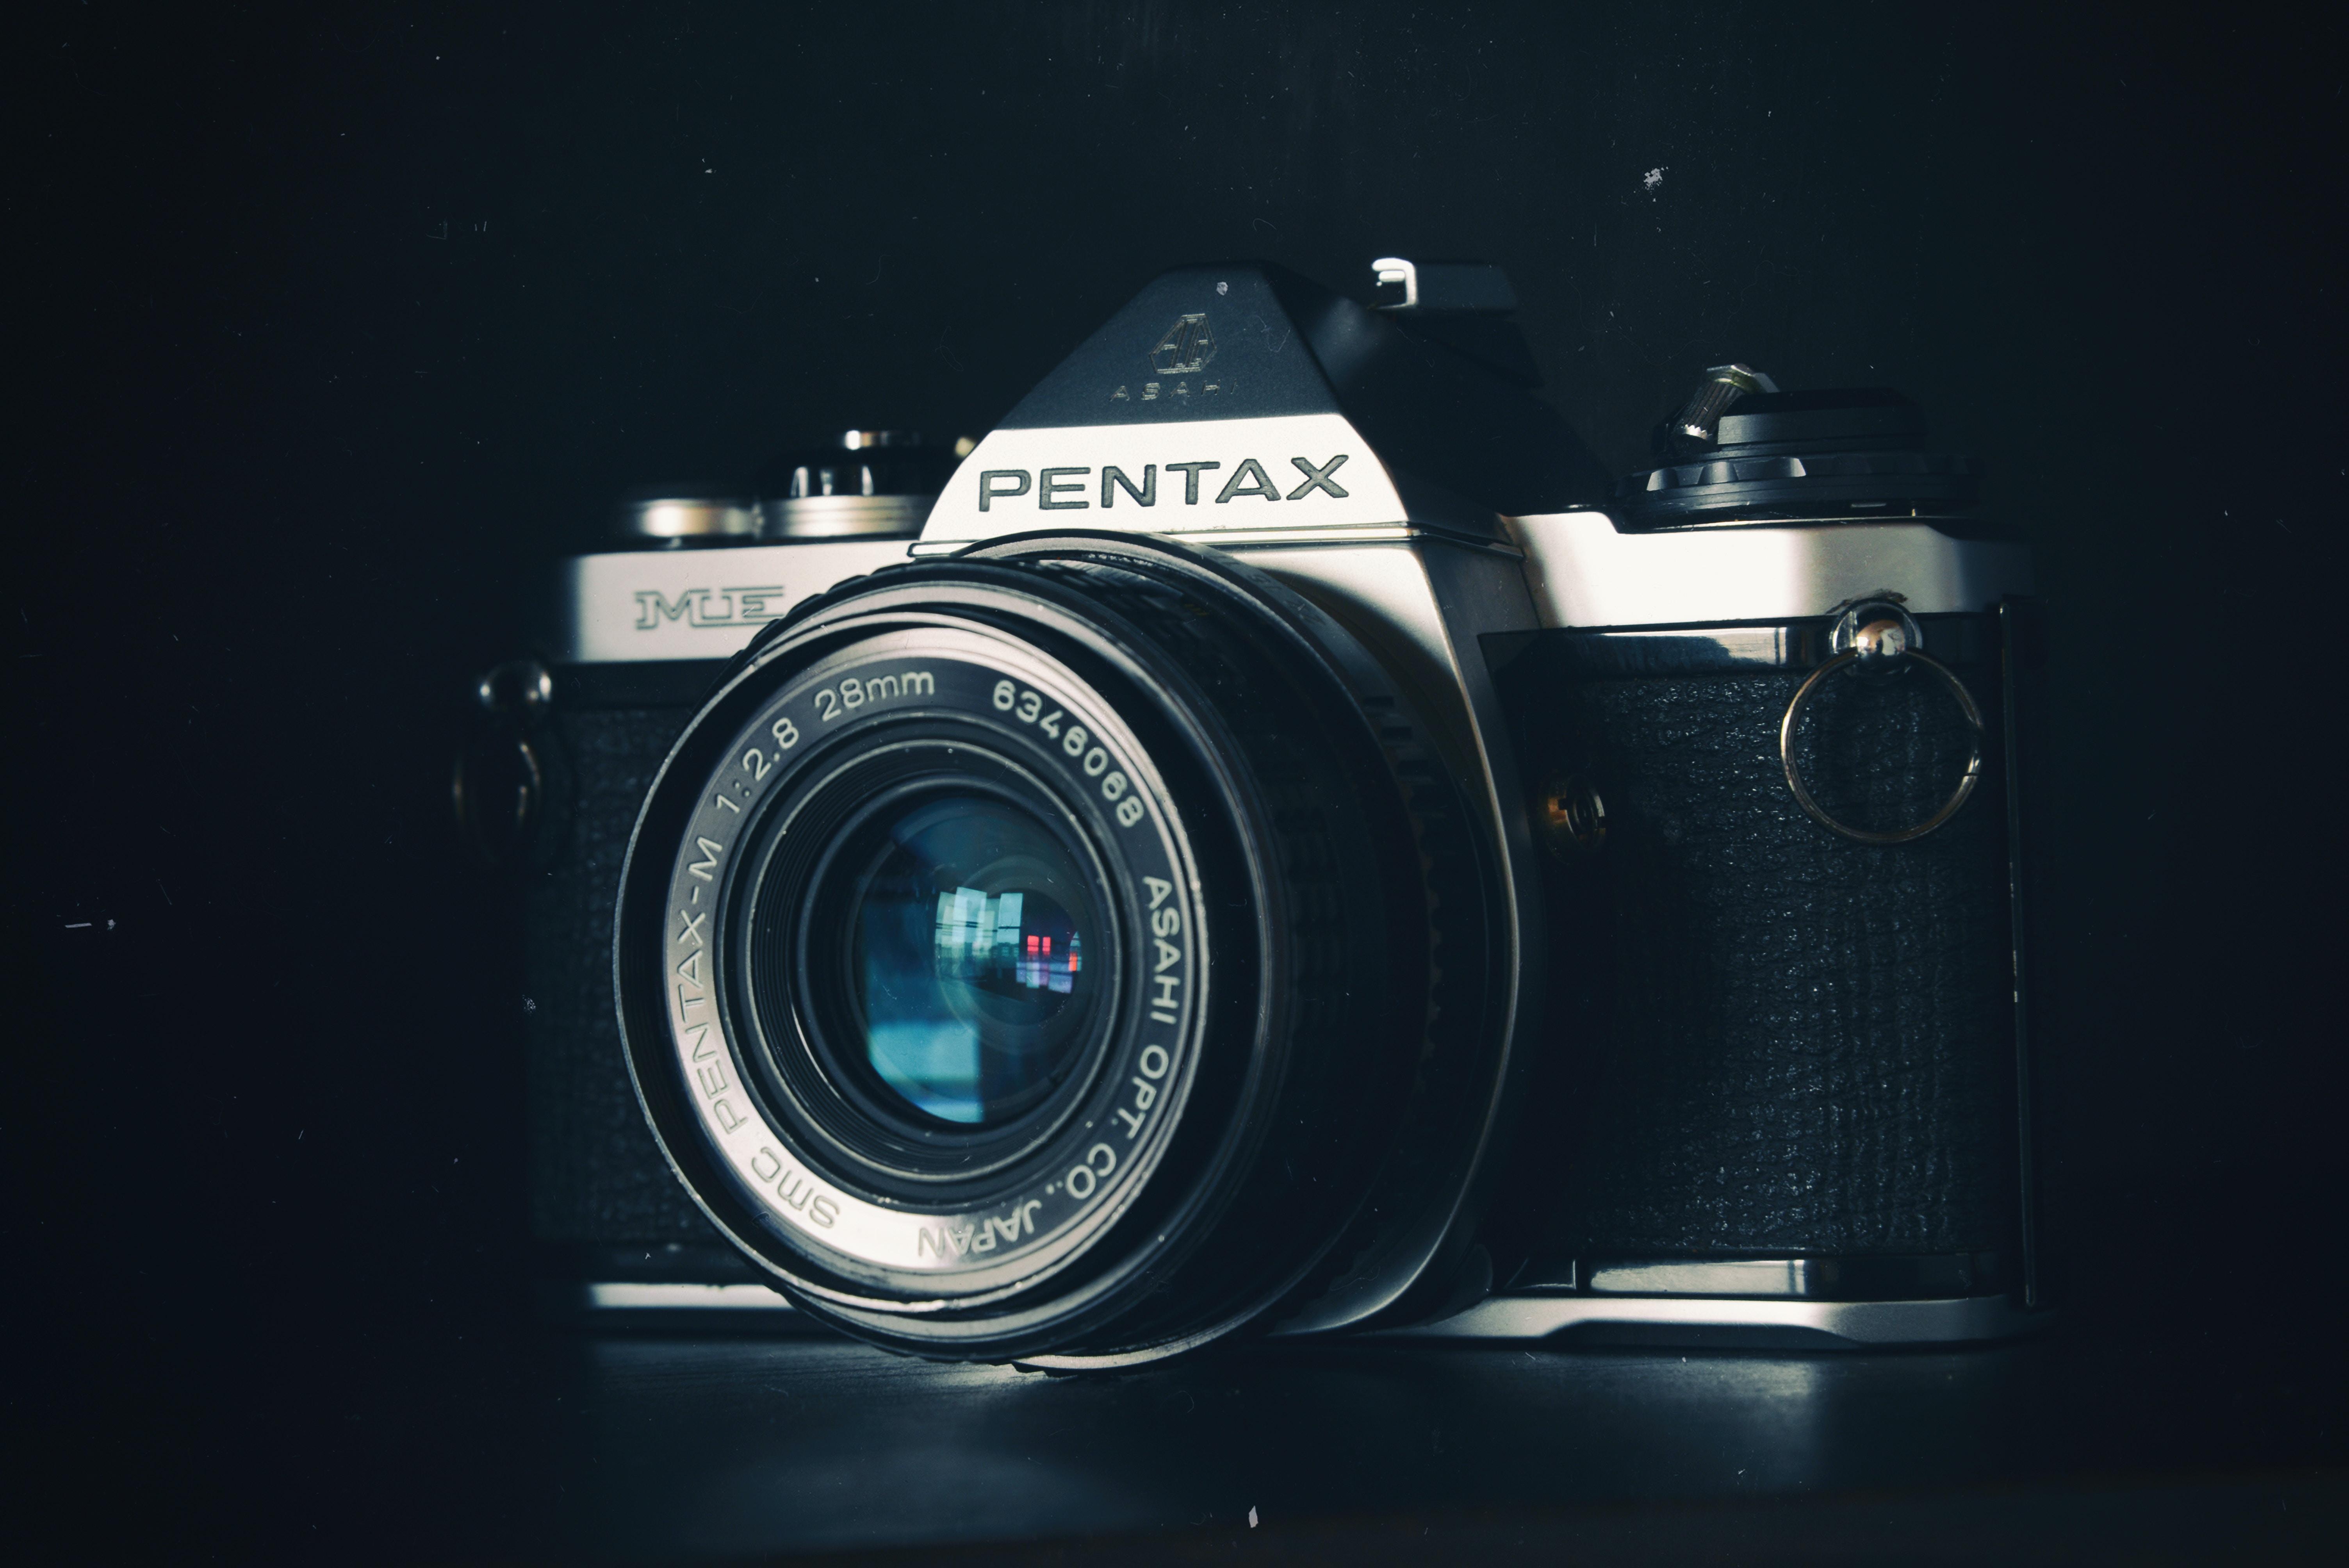 gray and black Pentax SLR camera